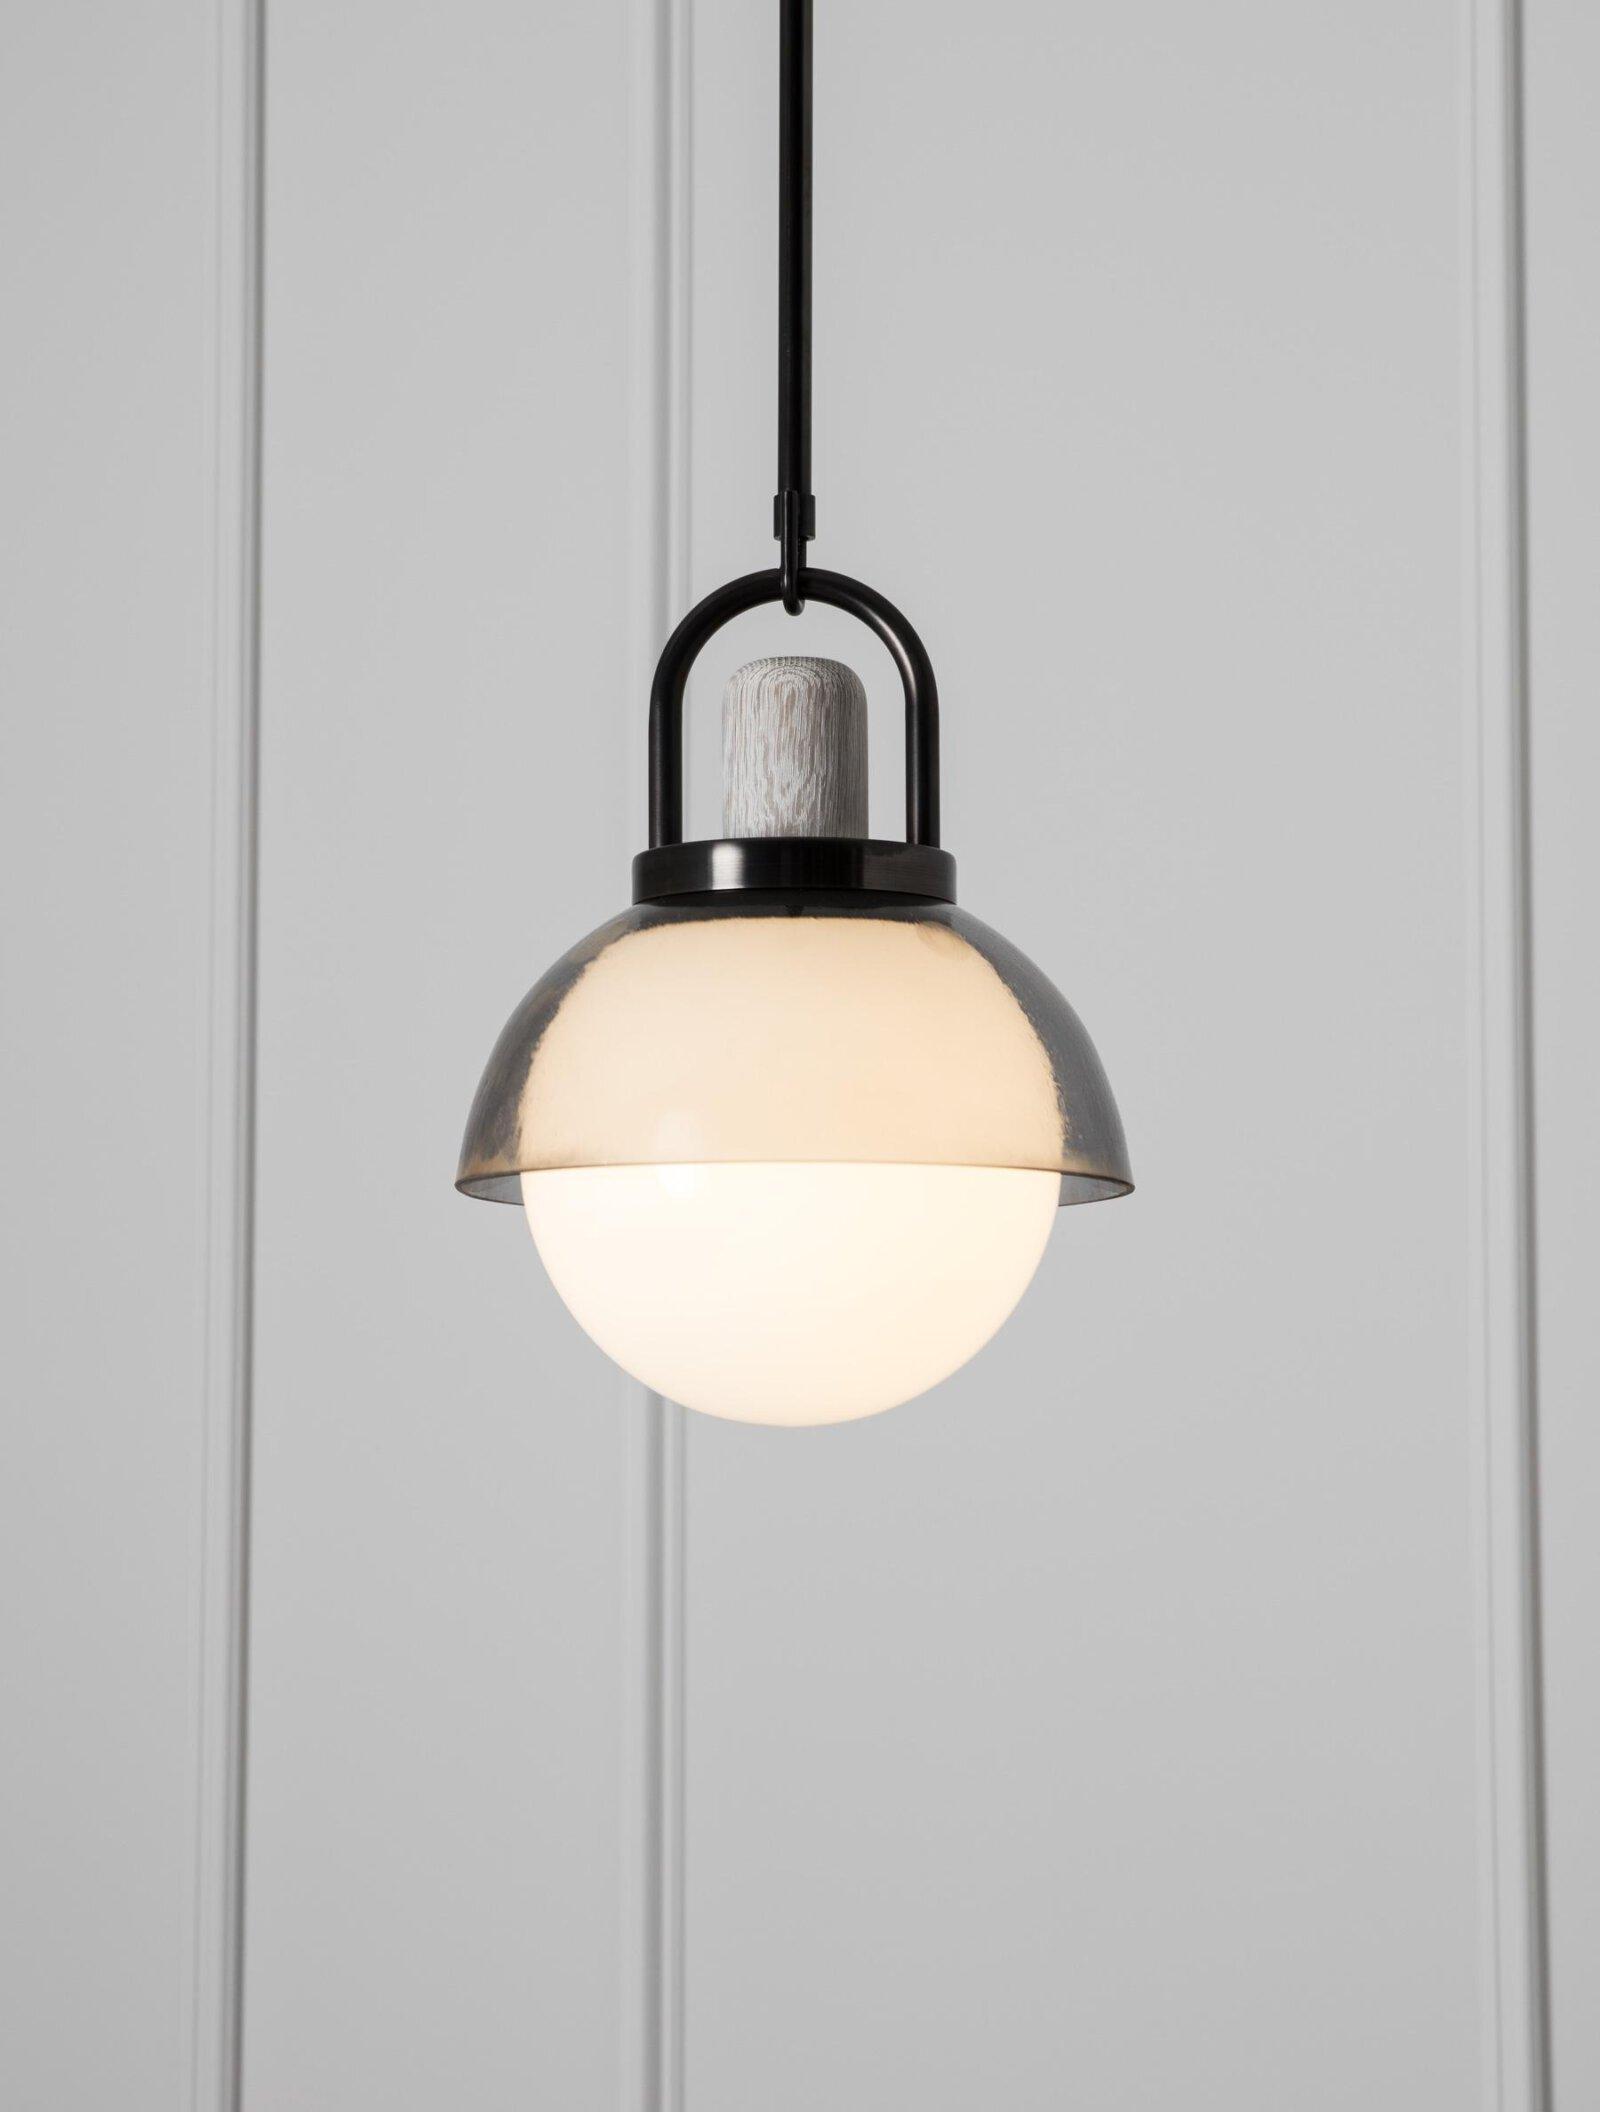 TinnappelMetz-allied-maker-glass-arc-dome-pendant